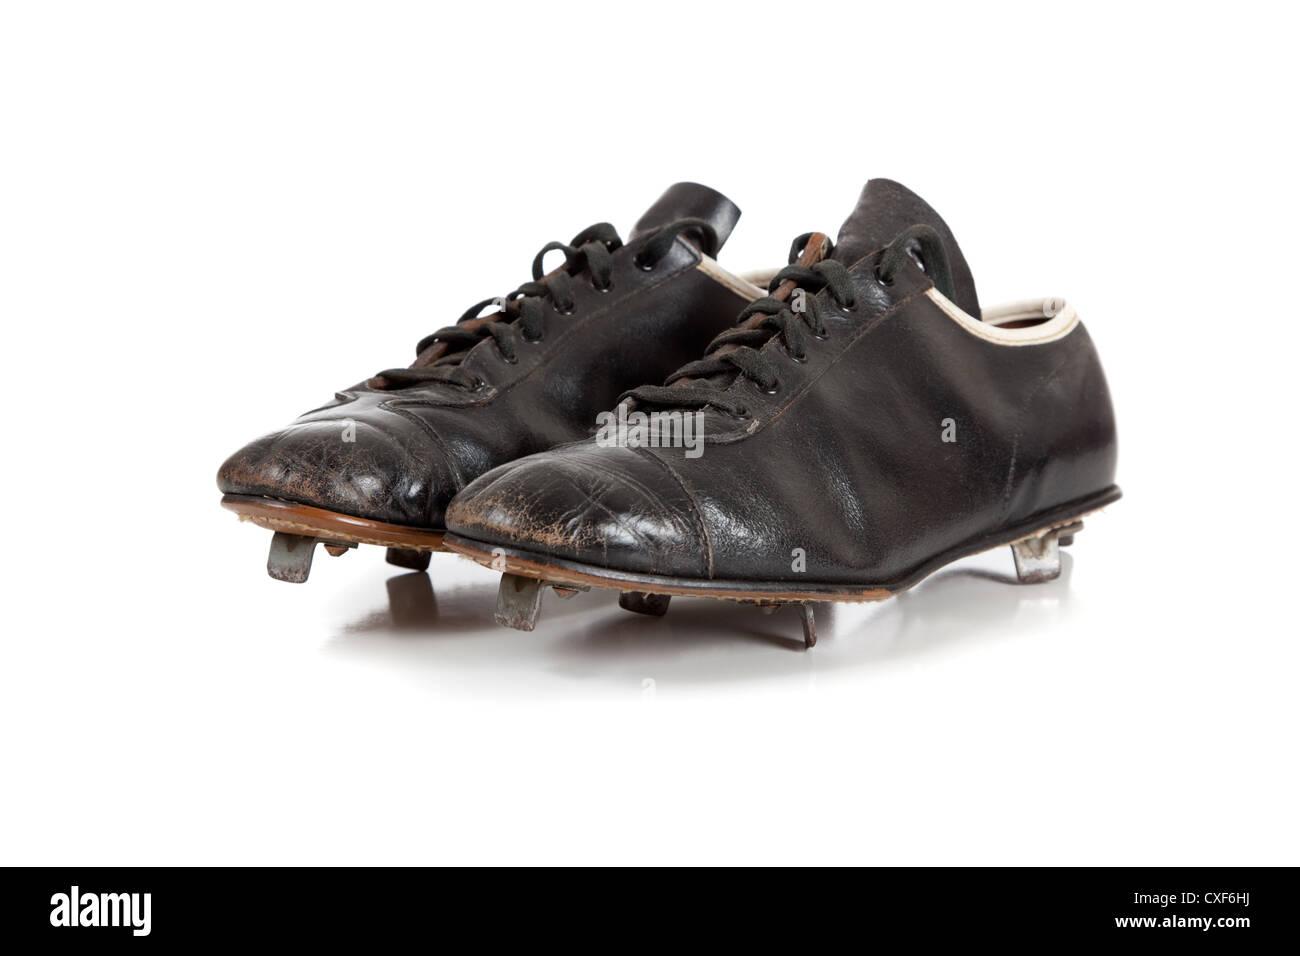 9b872271ba69 Baseball Shoes Stock Photos   Baseball Shoes Stock Images - Alamy